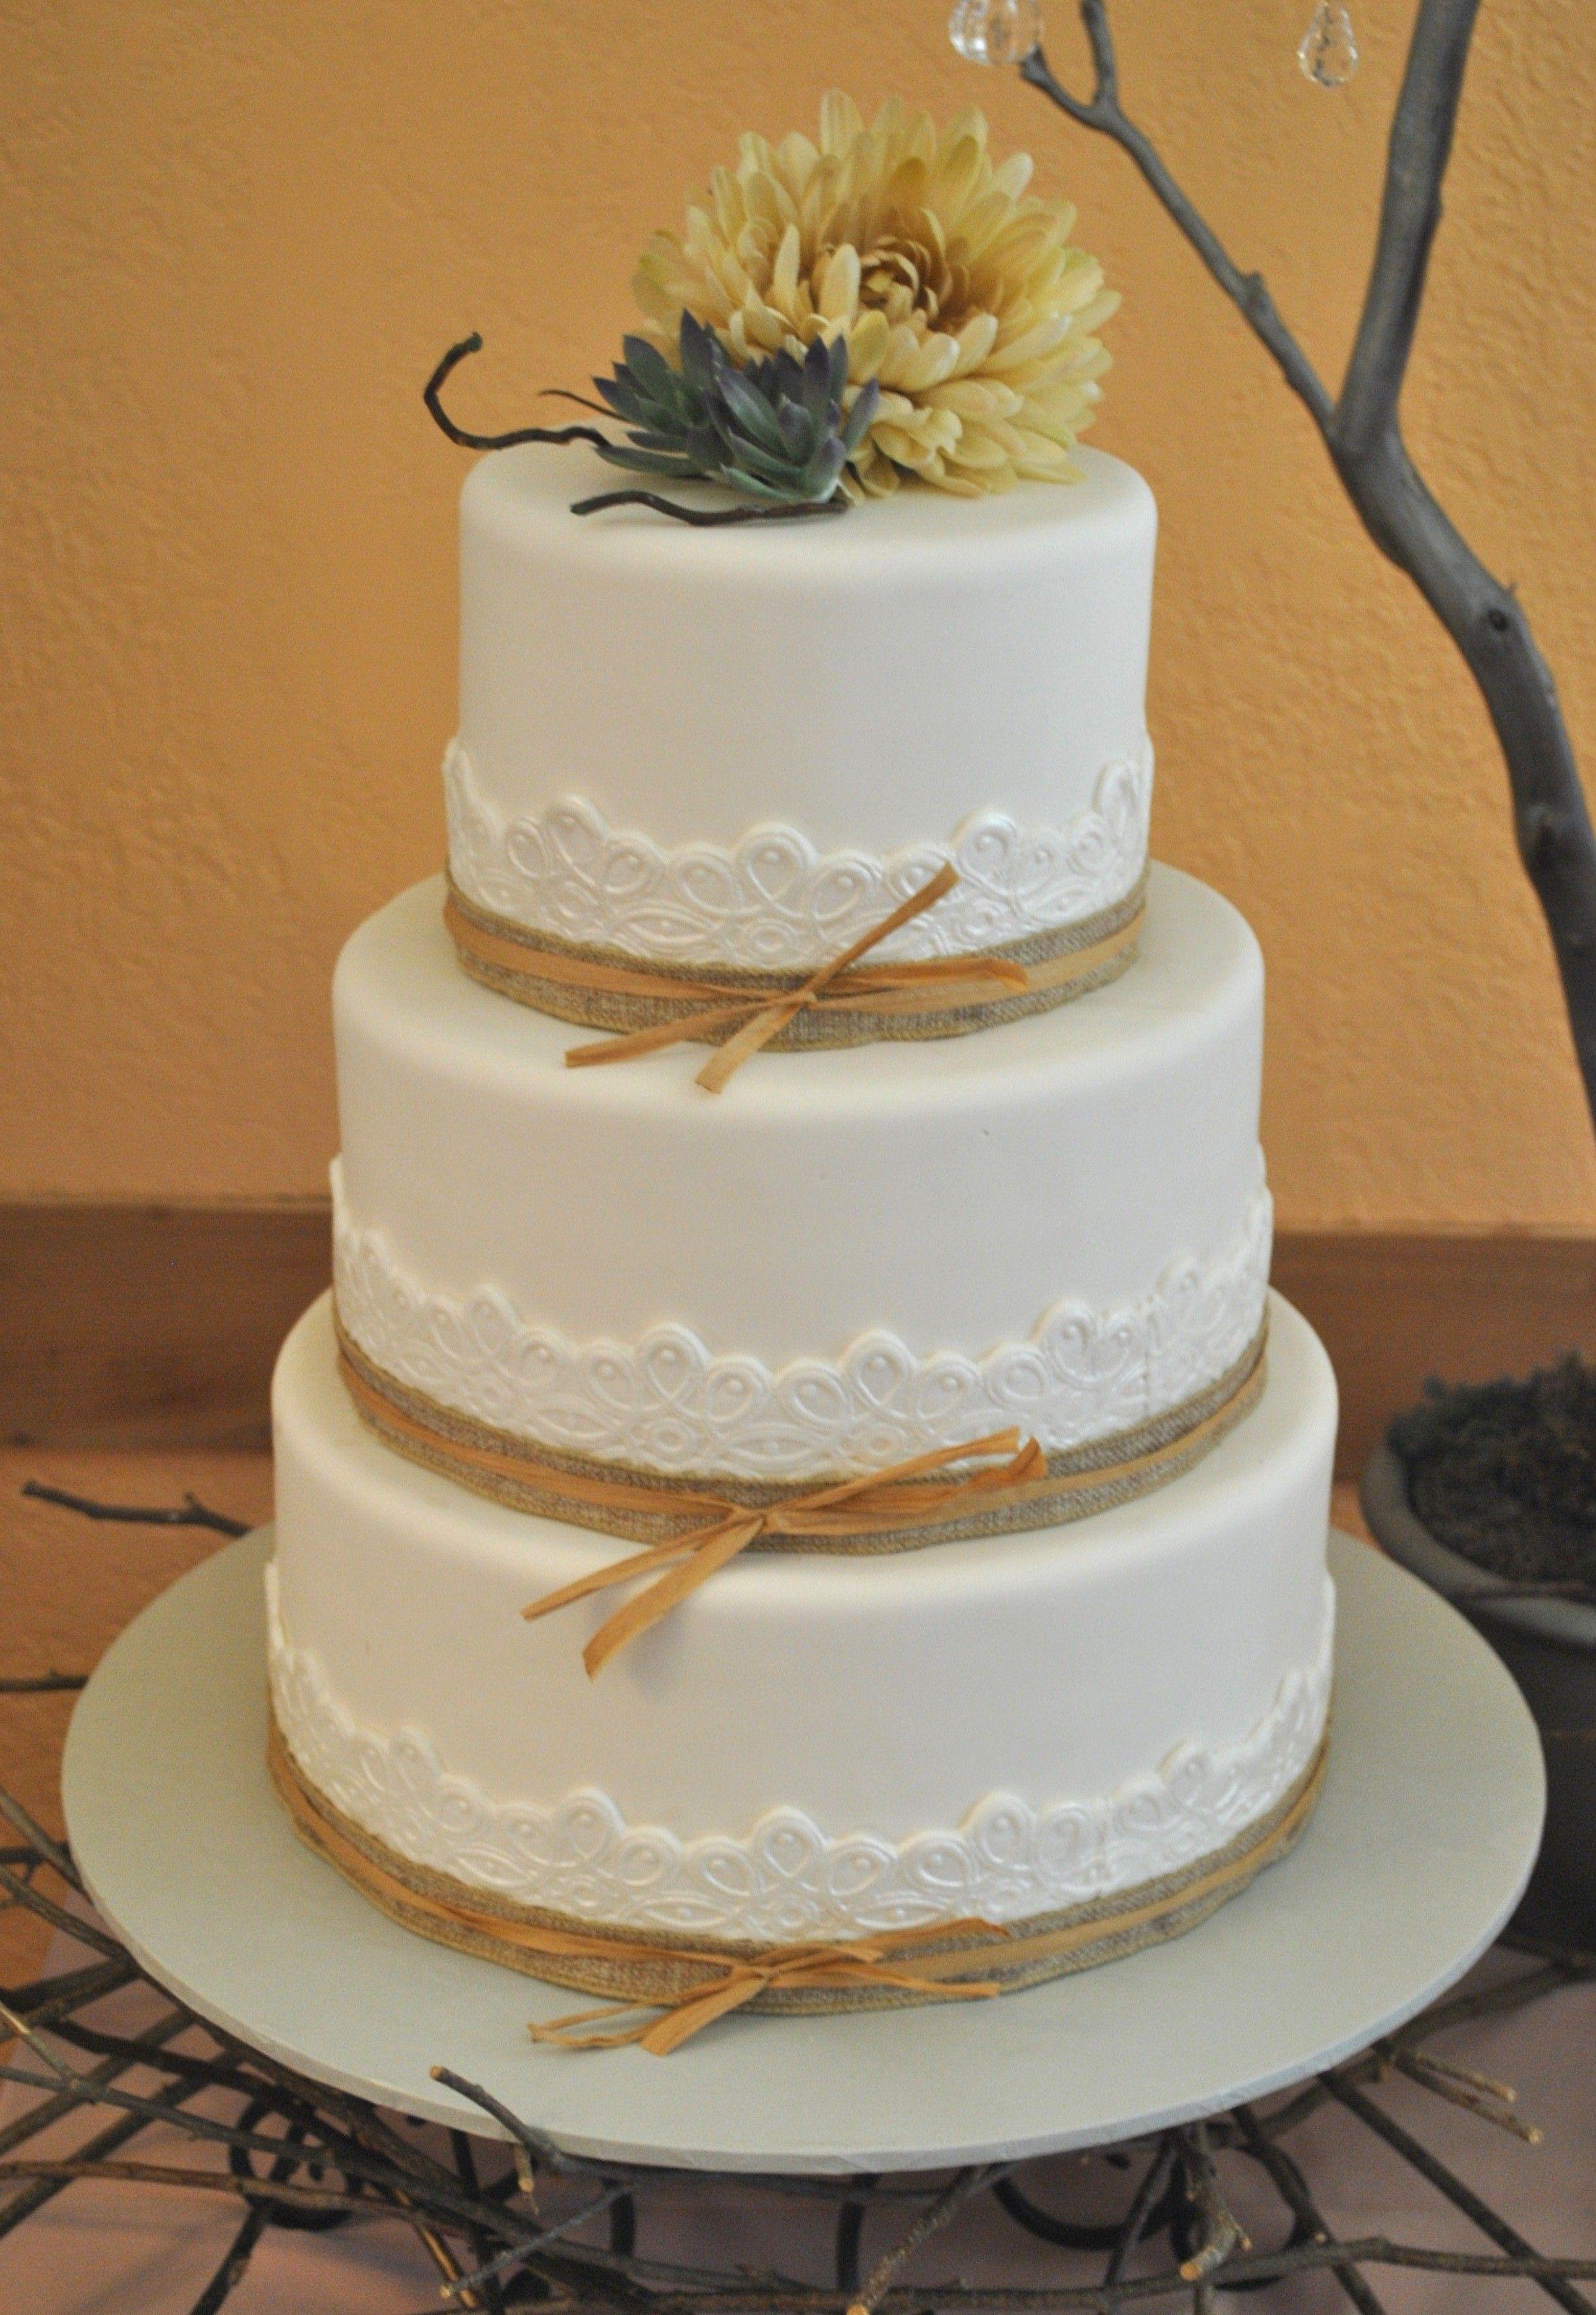 Burlap Lace Wedding Cake By The Cake Zone Www Thecakezone Com